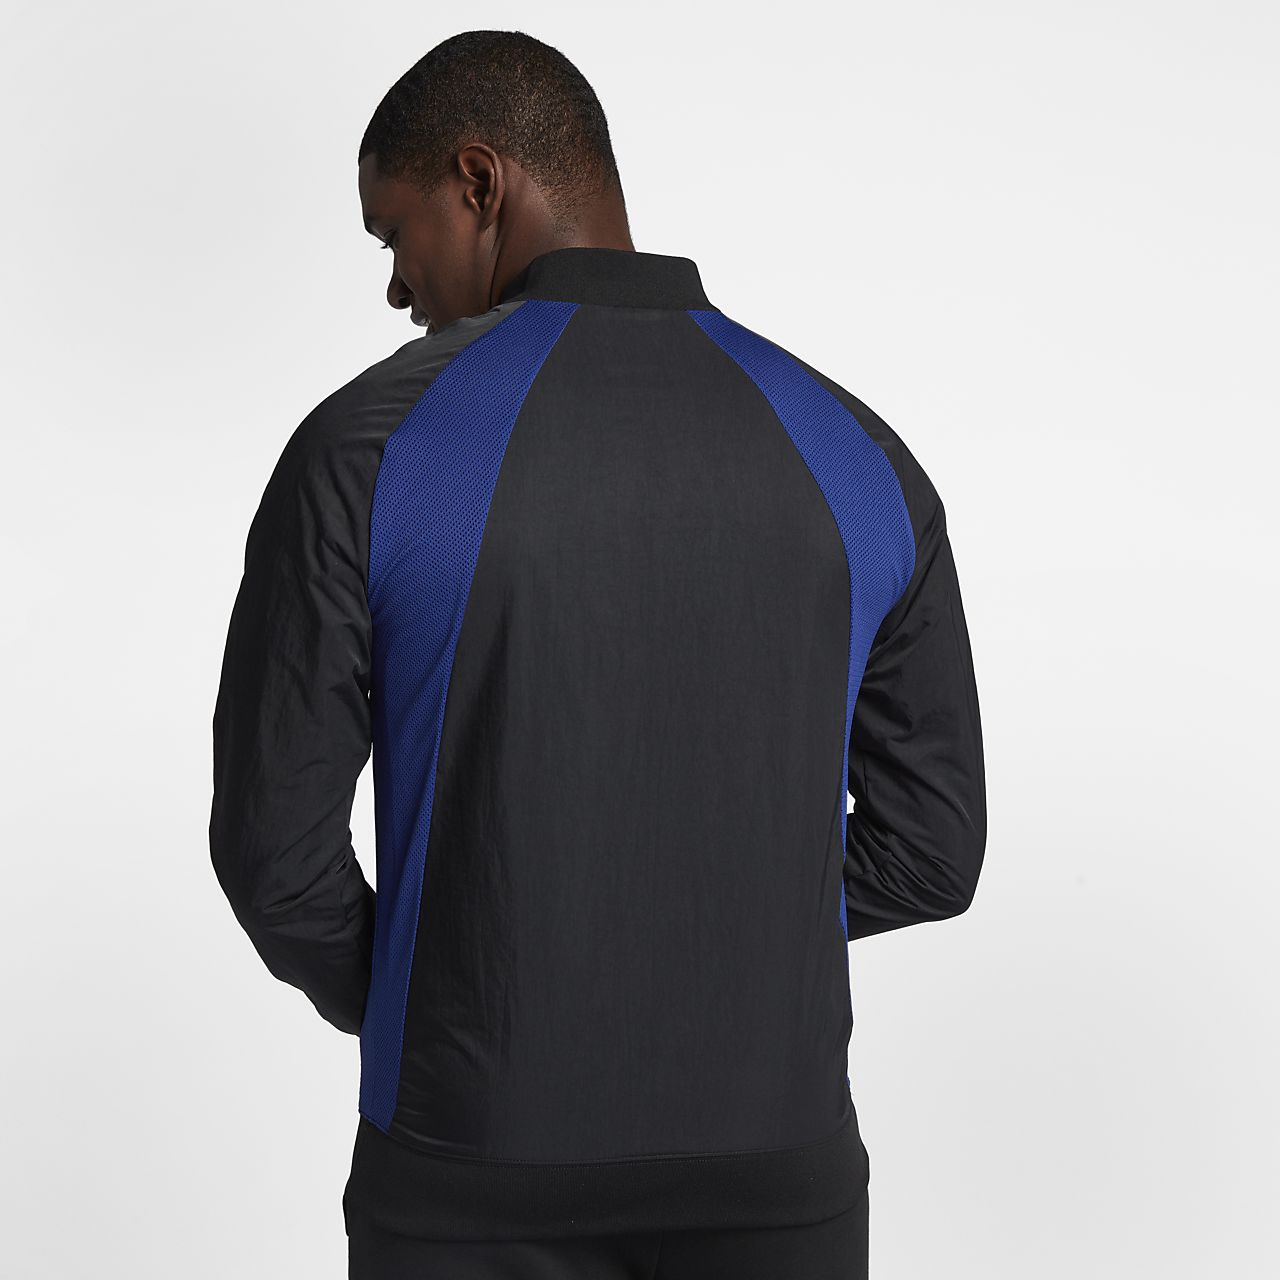 cdacb22e934 Air Jordan 1 Wings Men's Jacket. Nike.com IE